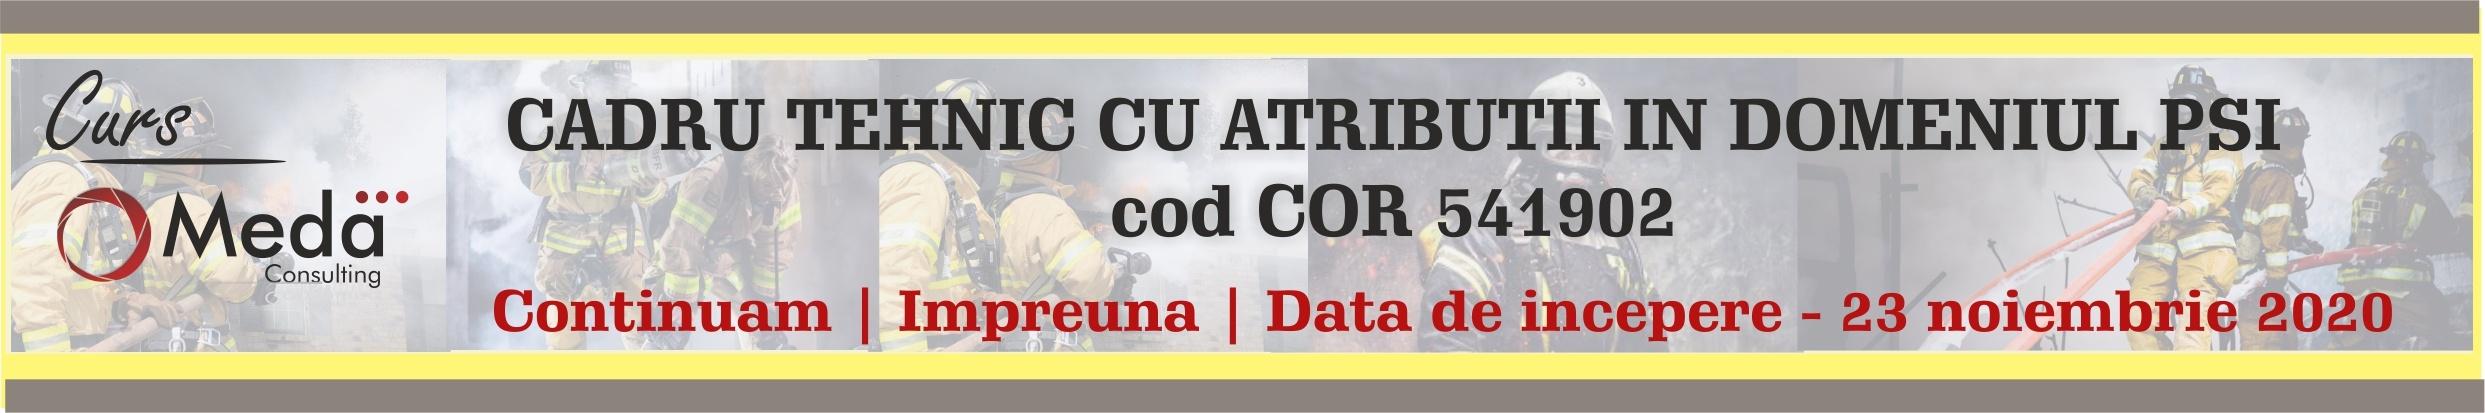 Cadru tehnic cu atributii in domeniul PSI cod cor 541902